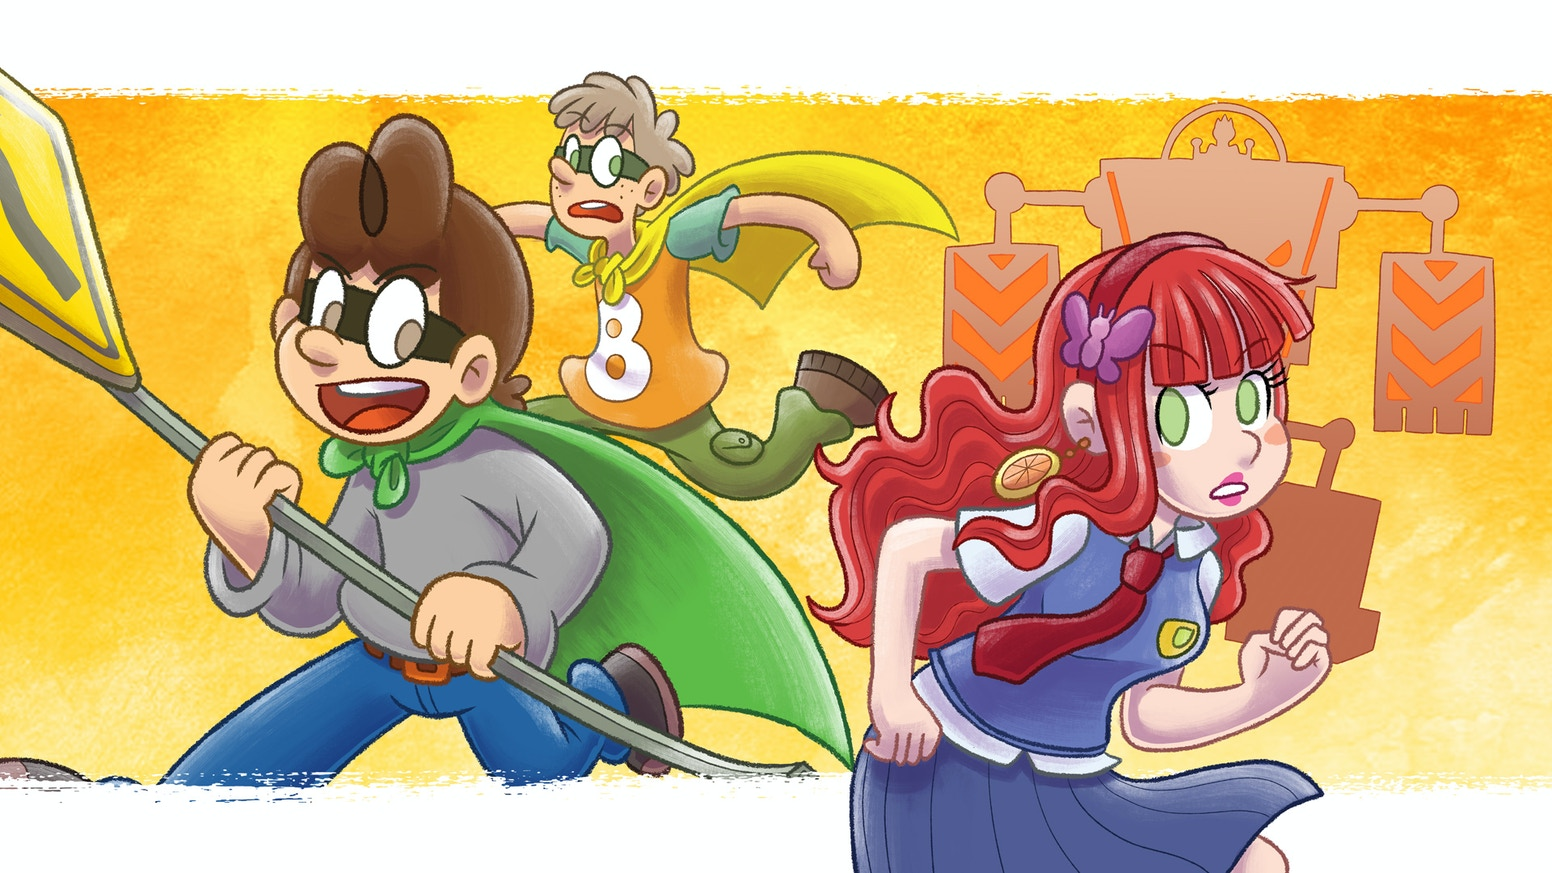 A silly, teenage superhero webcomic by Yves Bourgelas! / Une bande dessinée humoristique de superhéros adolescents, par Yves Bourgelas!